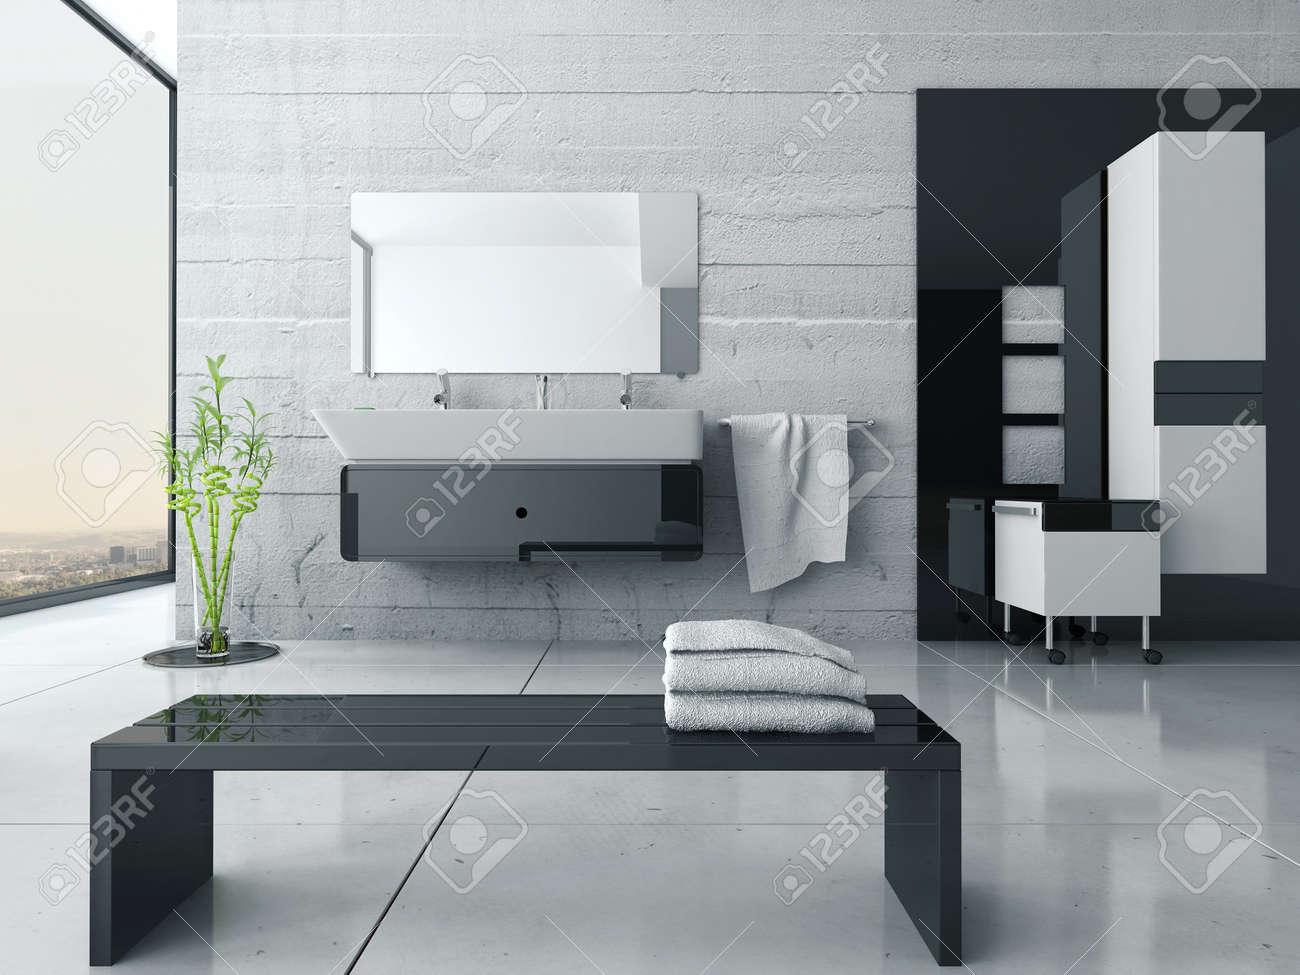 Salle De Bain Noir Et Vert Alamode Furniture Com